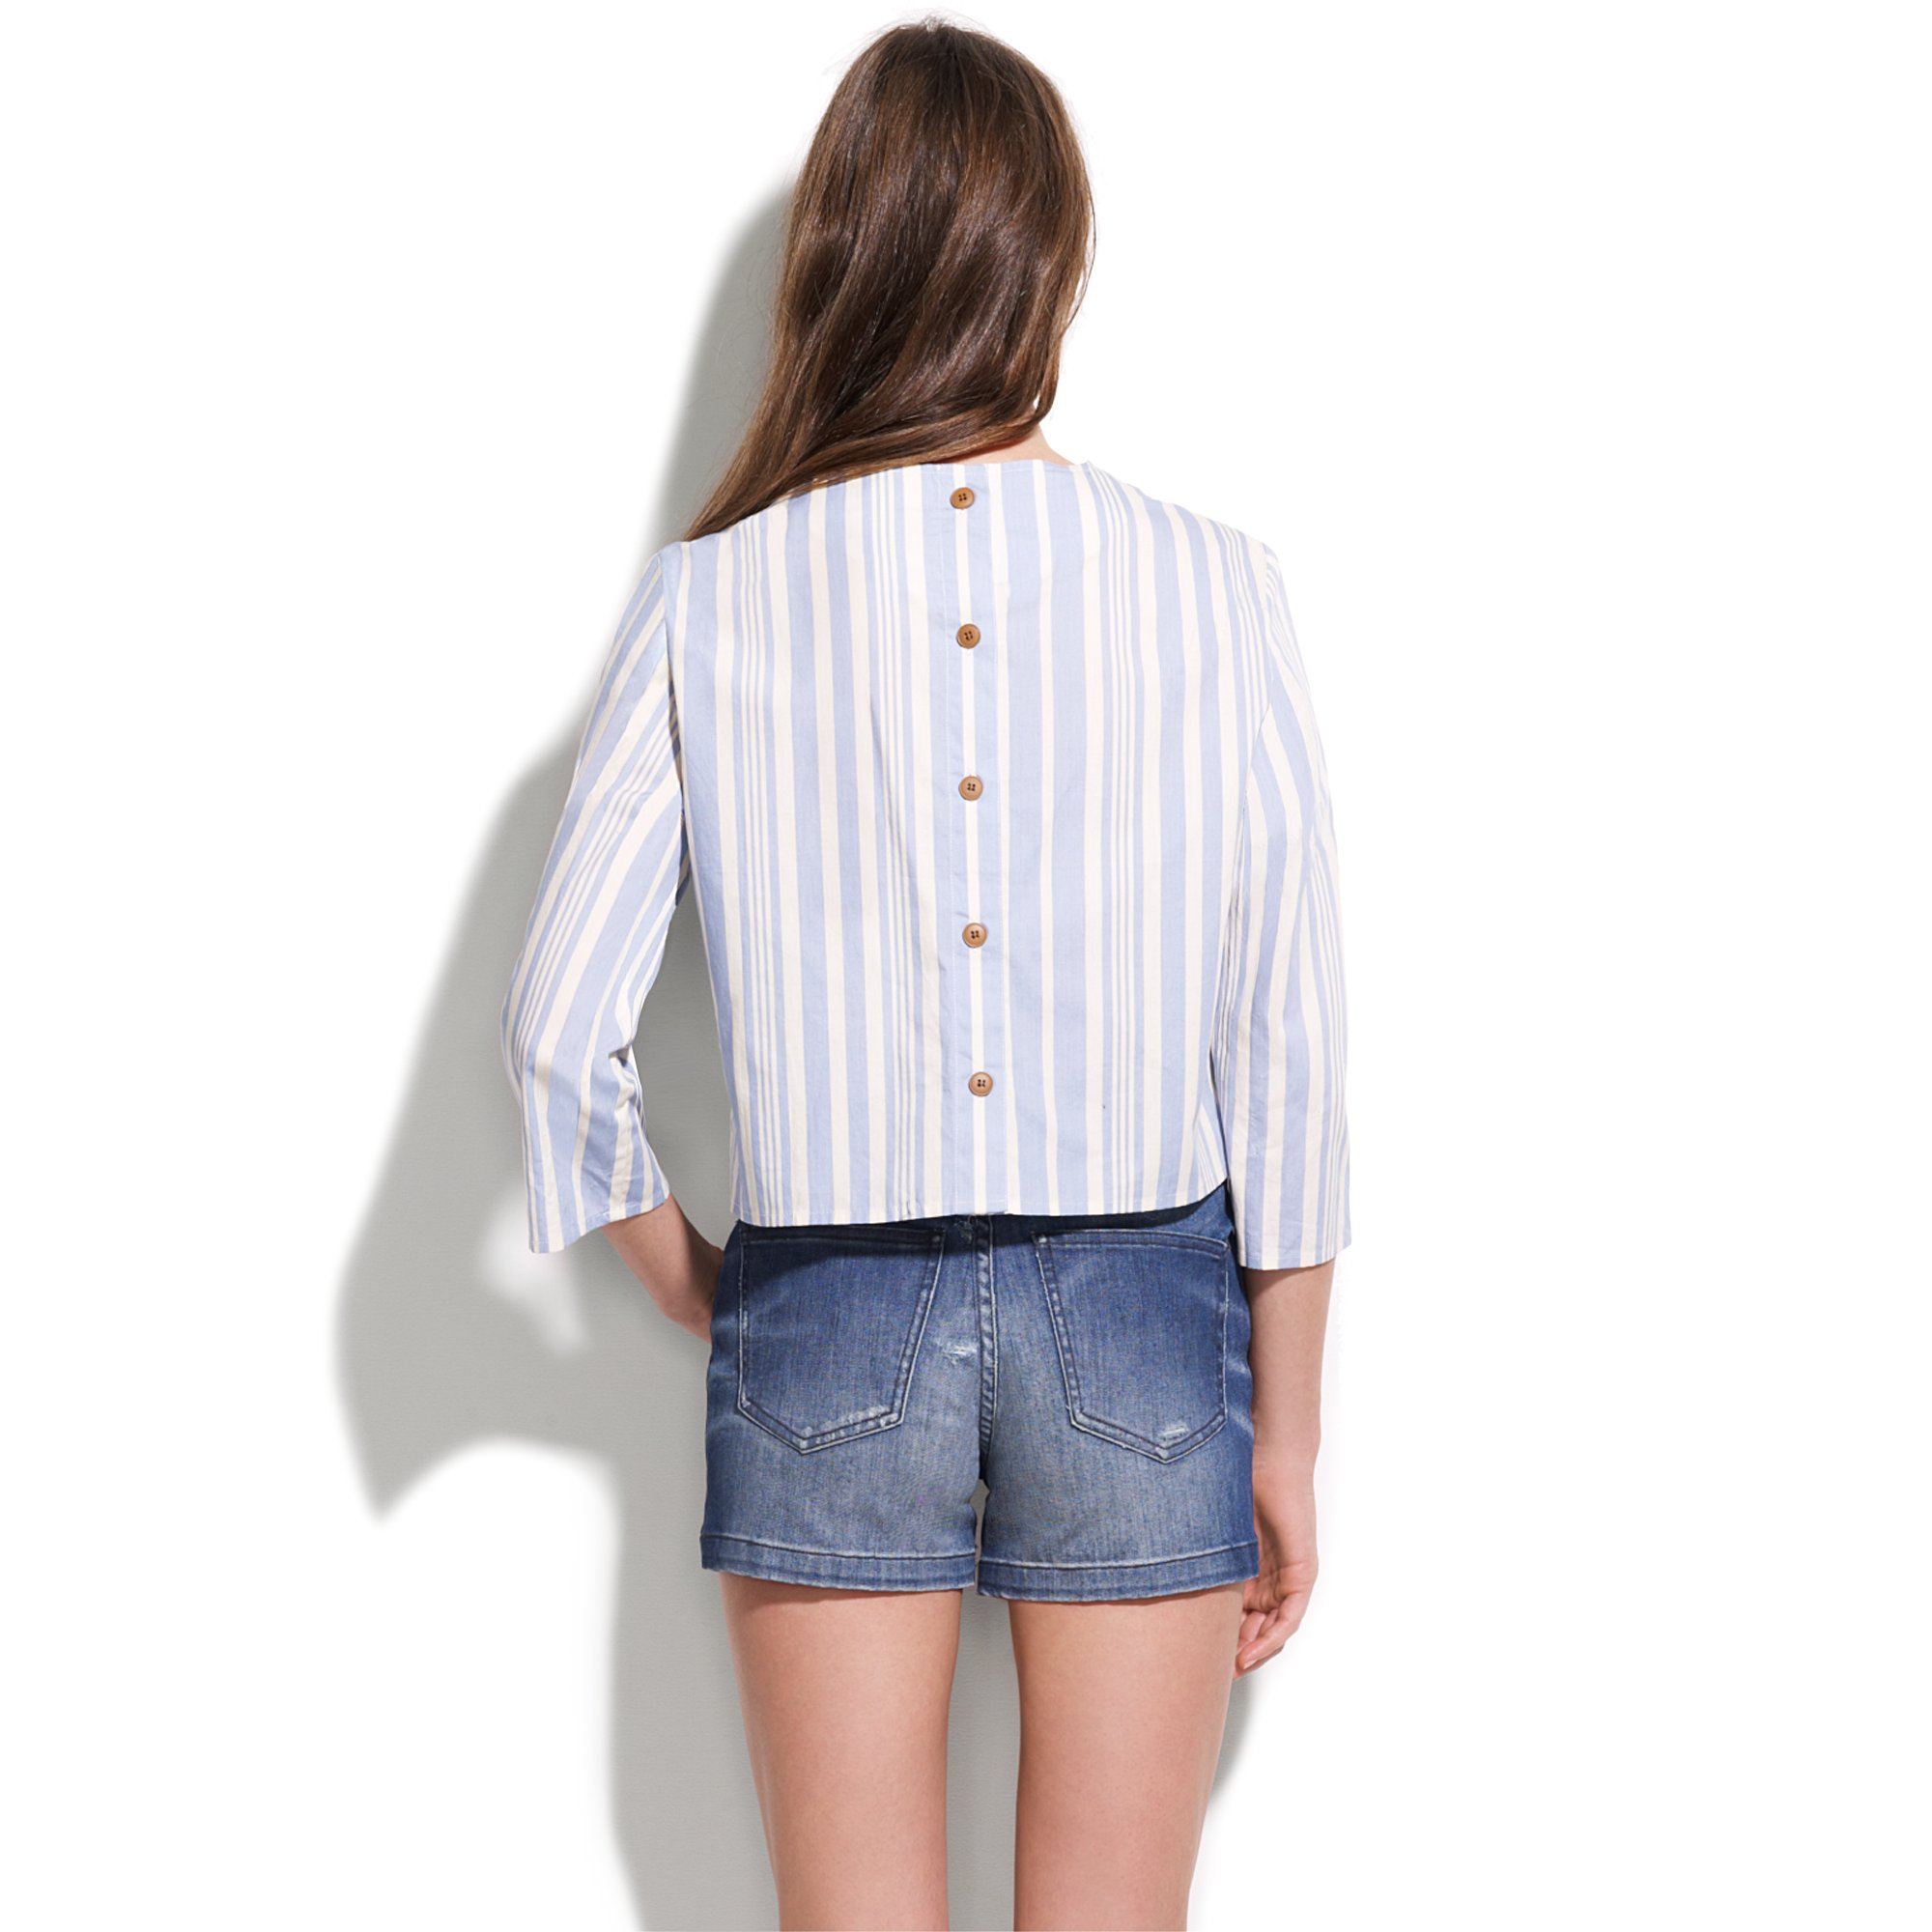 DENIM - Denim shorts Le Mont St Michel z7VY8v